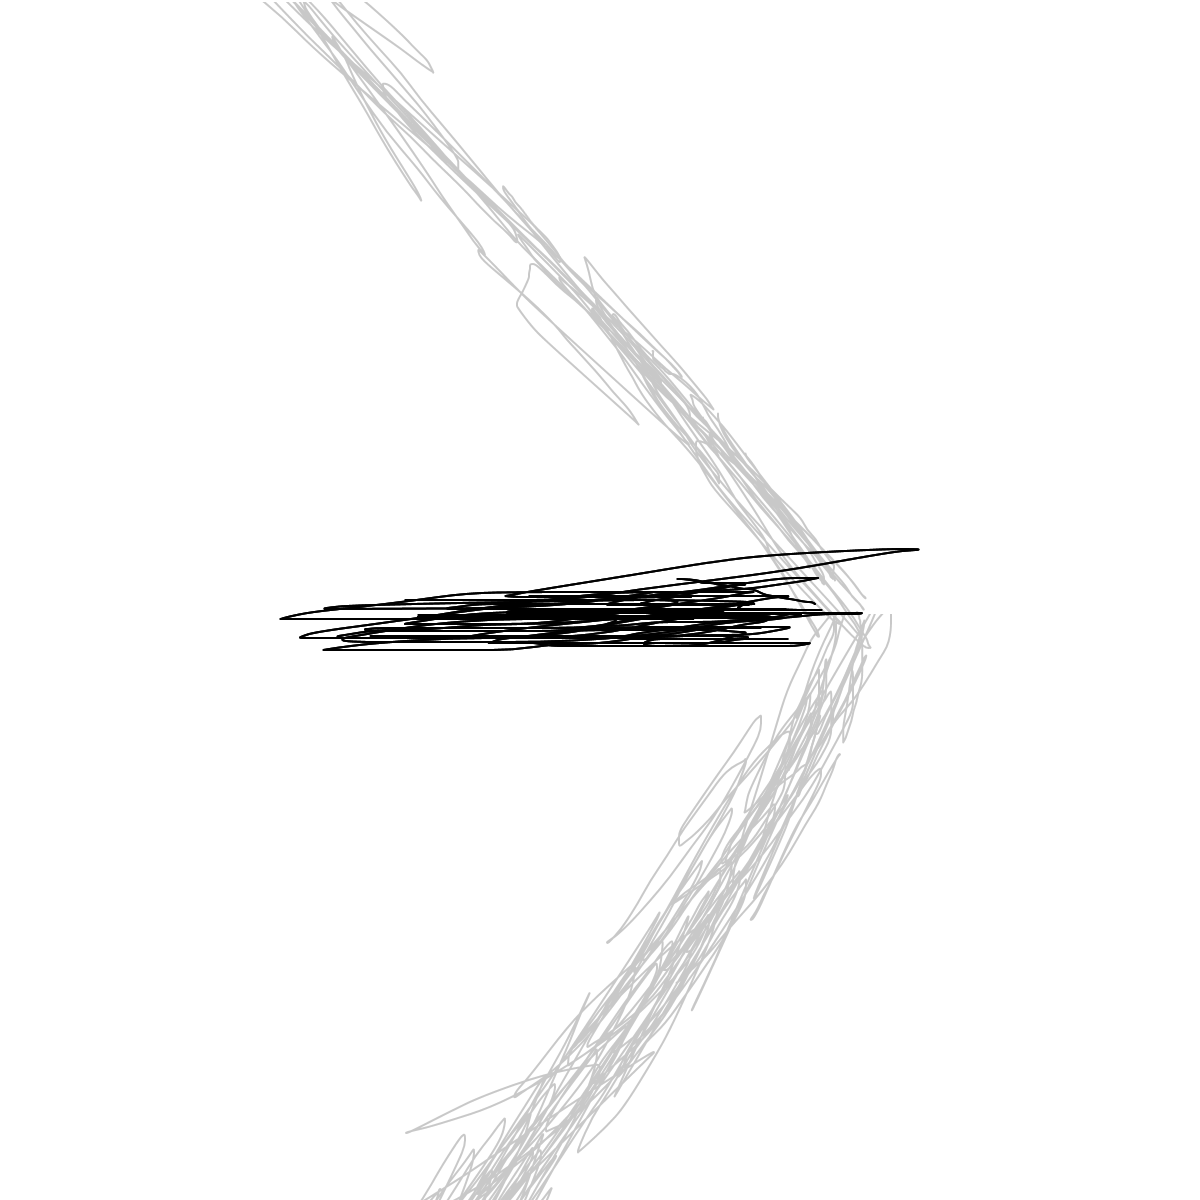 BAAAM drawing#11382 lat:52.4759941101074200lng: 13.4062061309814450